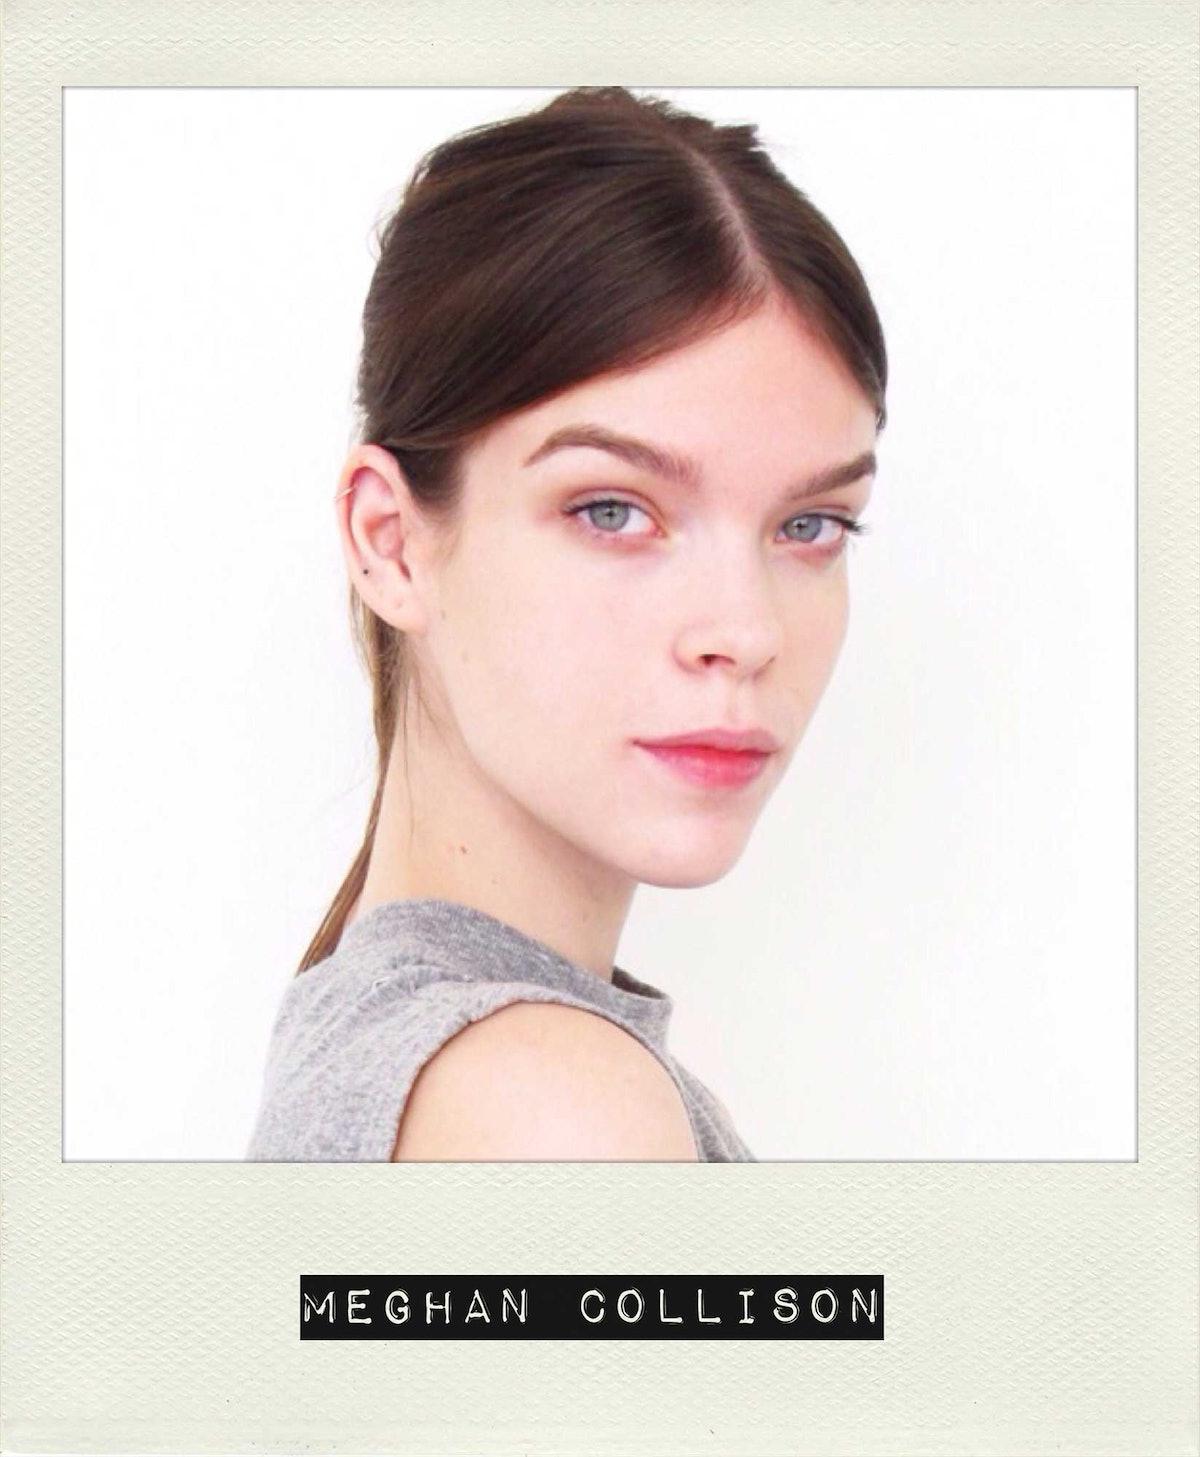 Meghan Collison